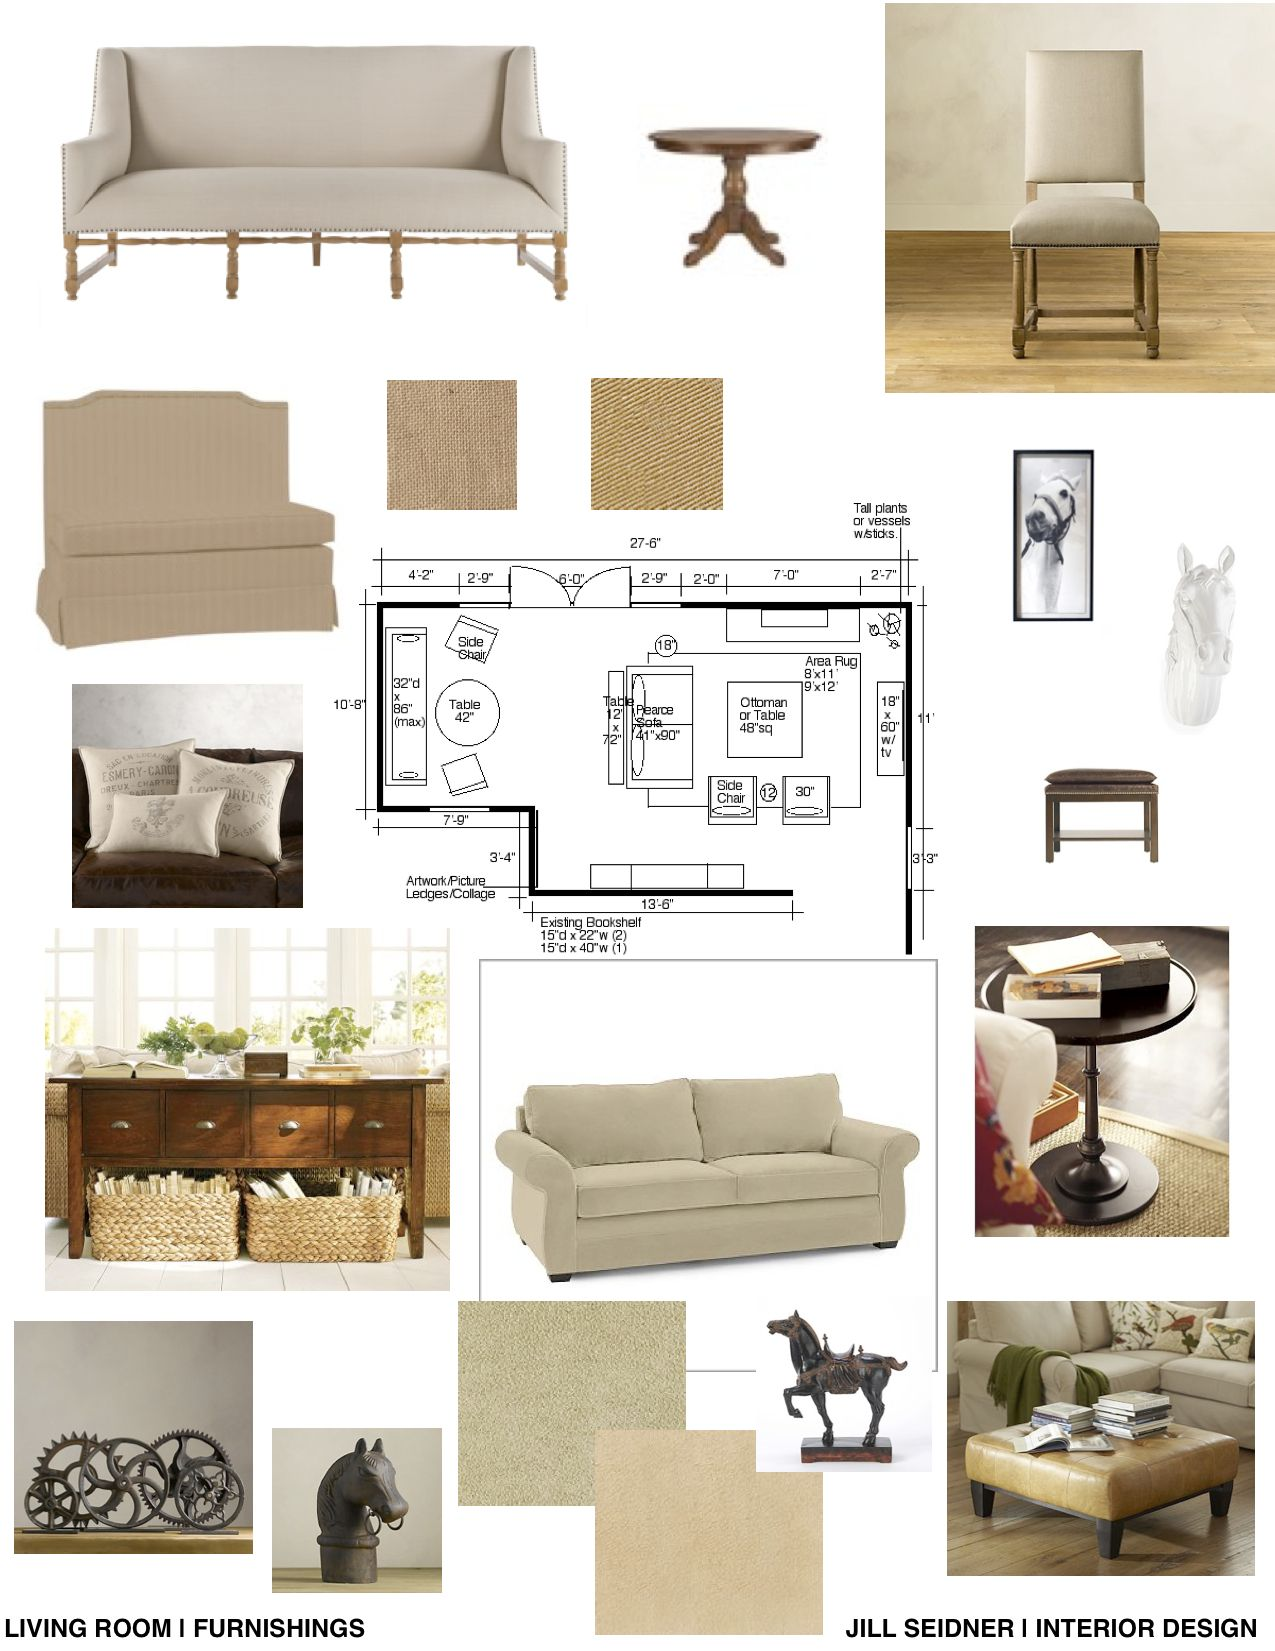 Concept Board For Living Room Furnishings Interior Design Tools Interior Design Boards Inspiration Board Design